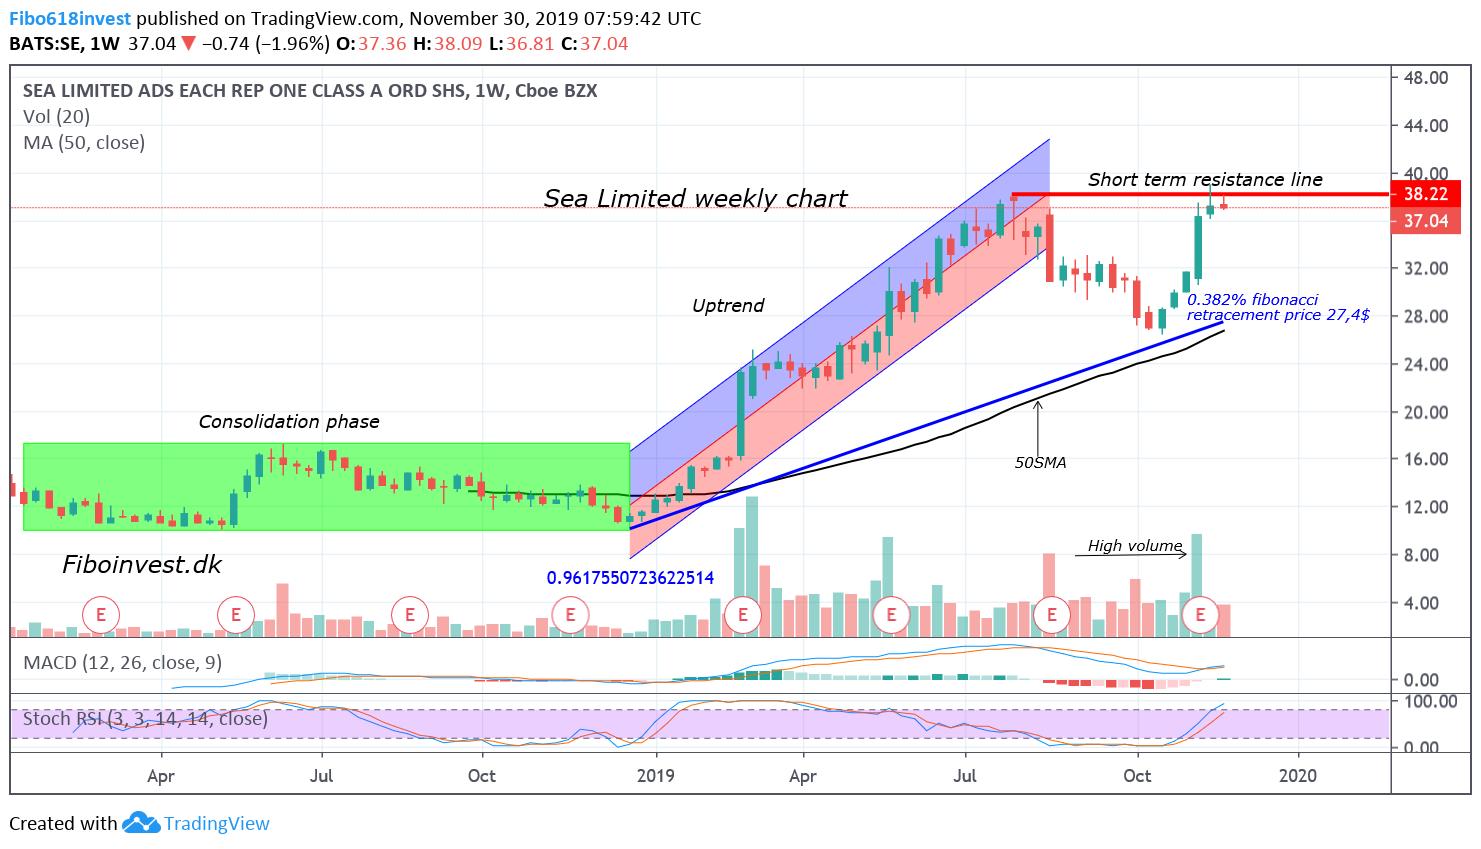 TA af Sea limited uge chart 30-11-19